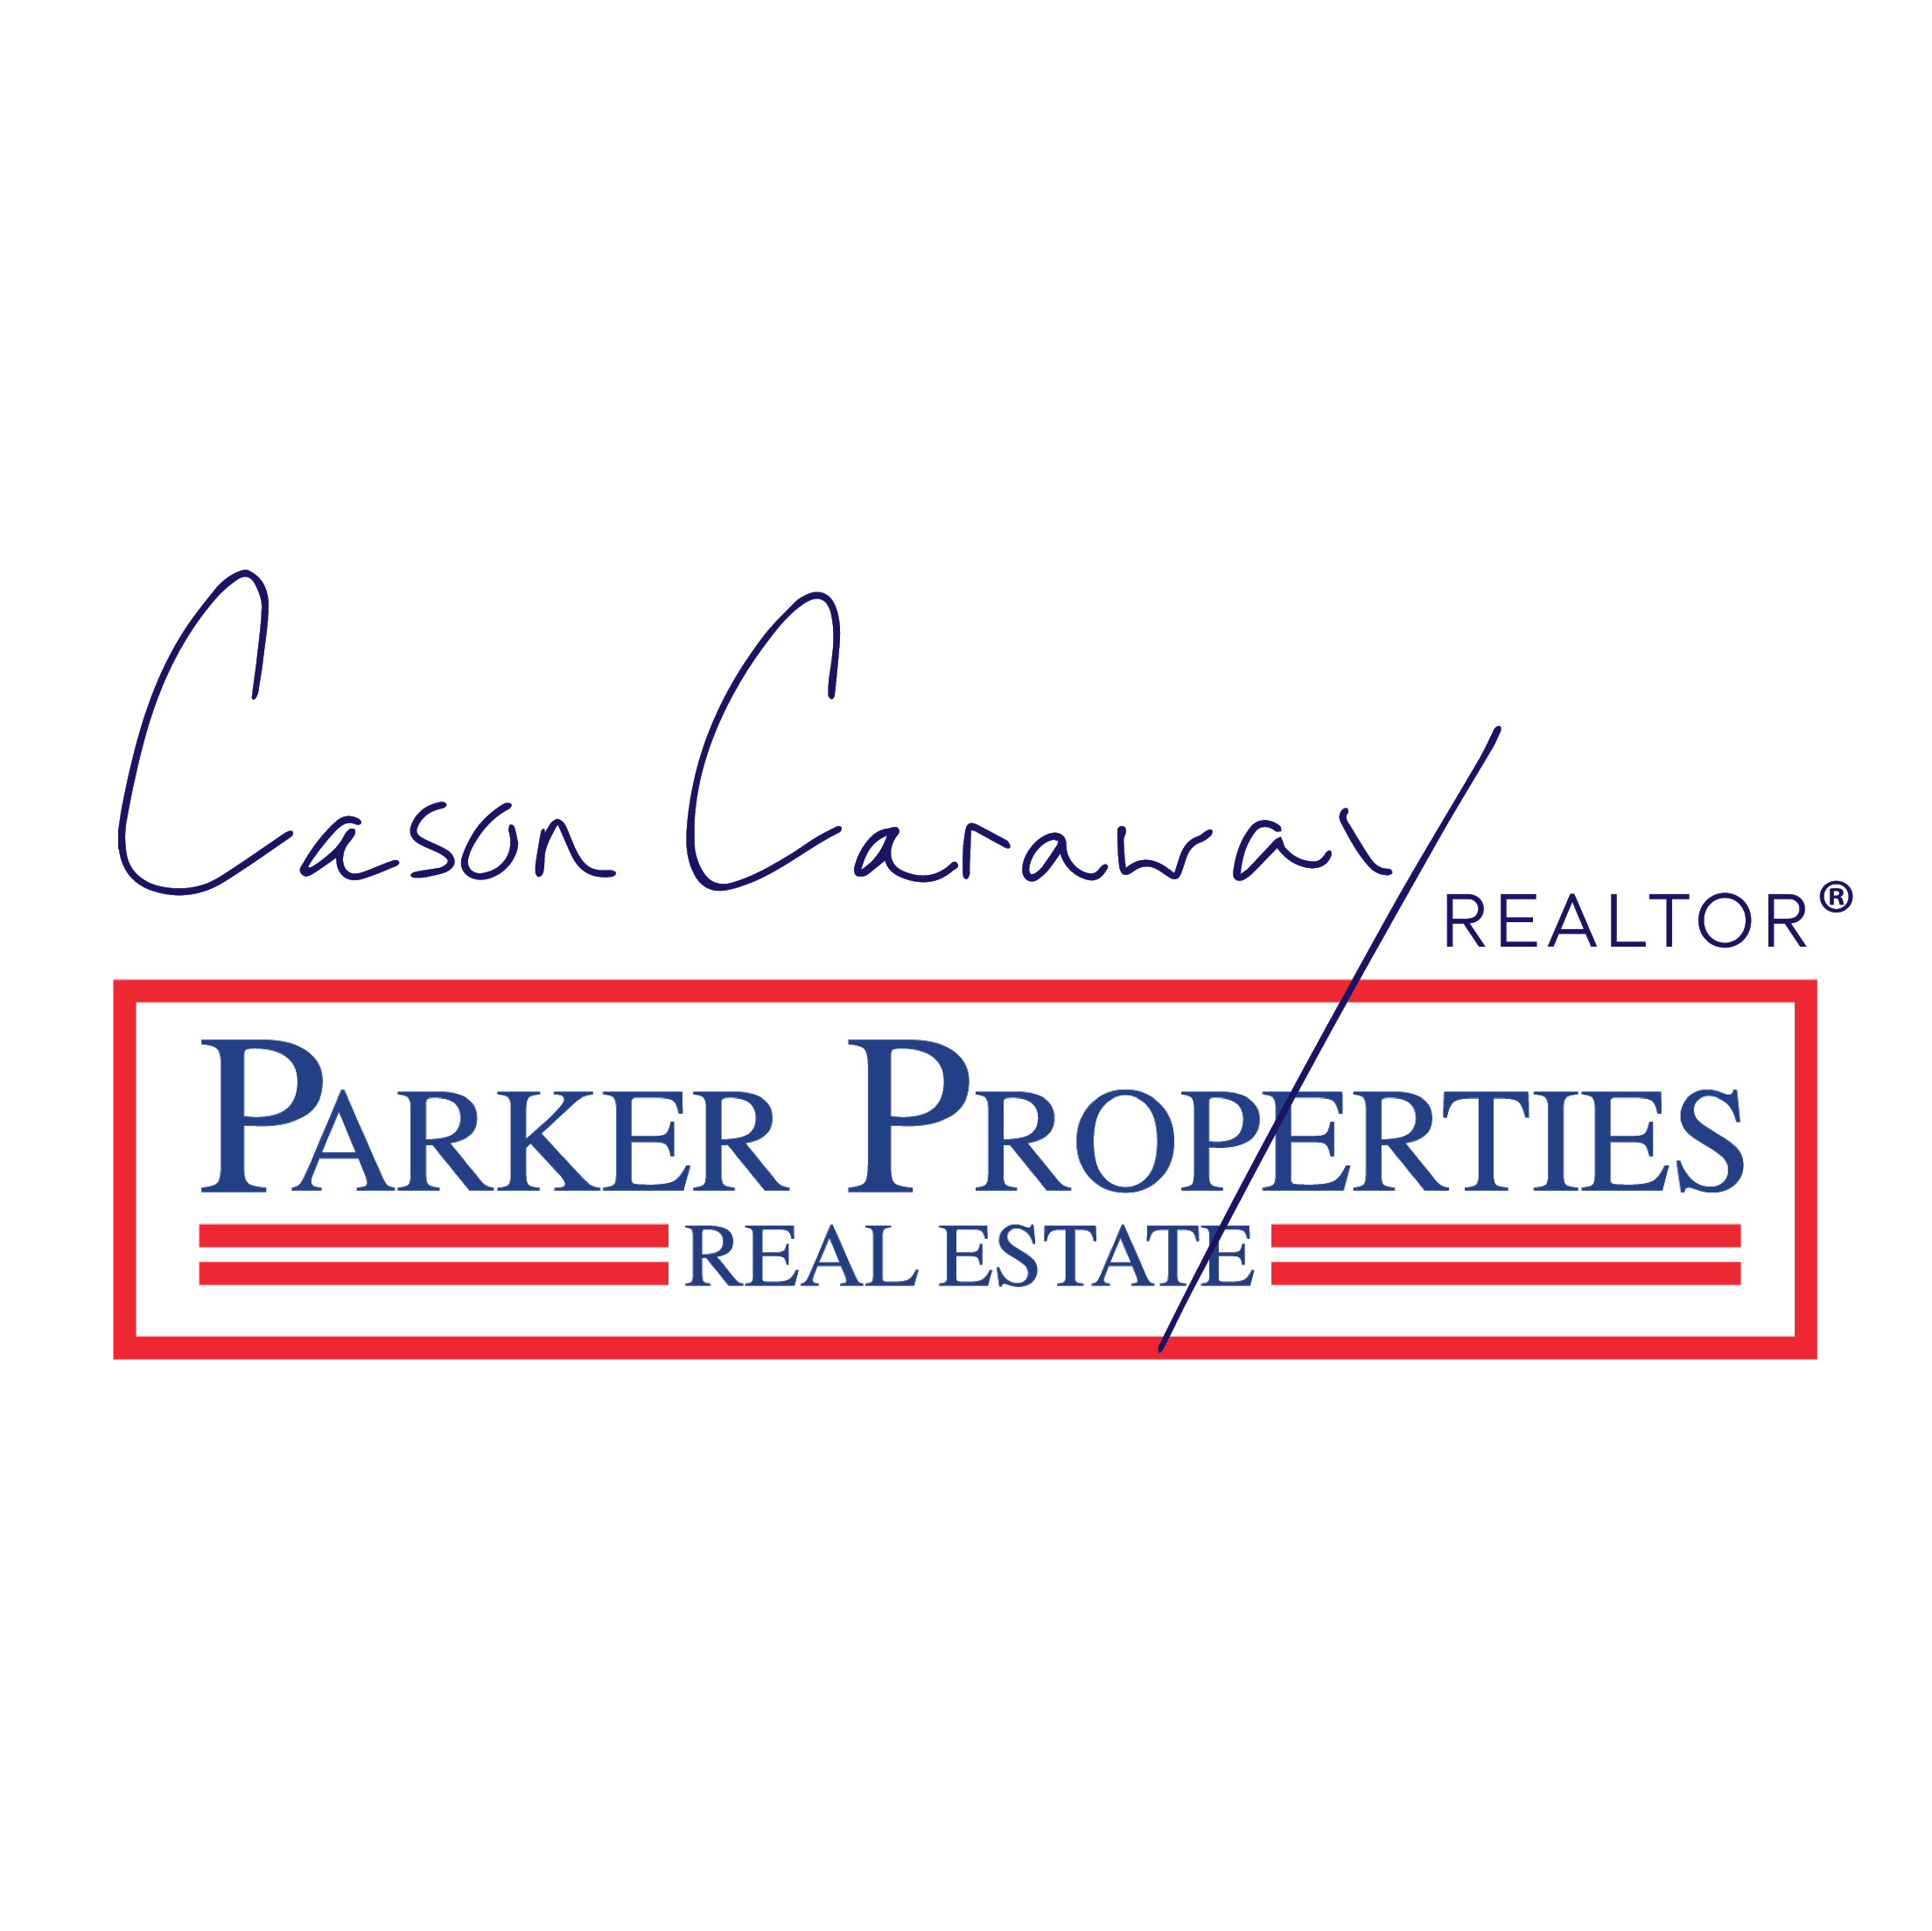 CasonCarawayRealtor_ParkerProperties